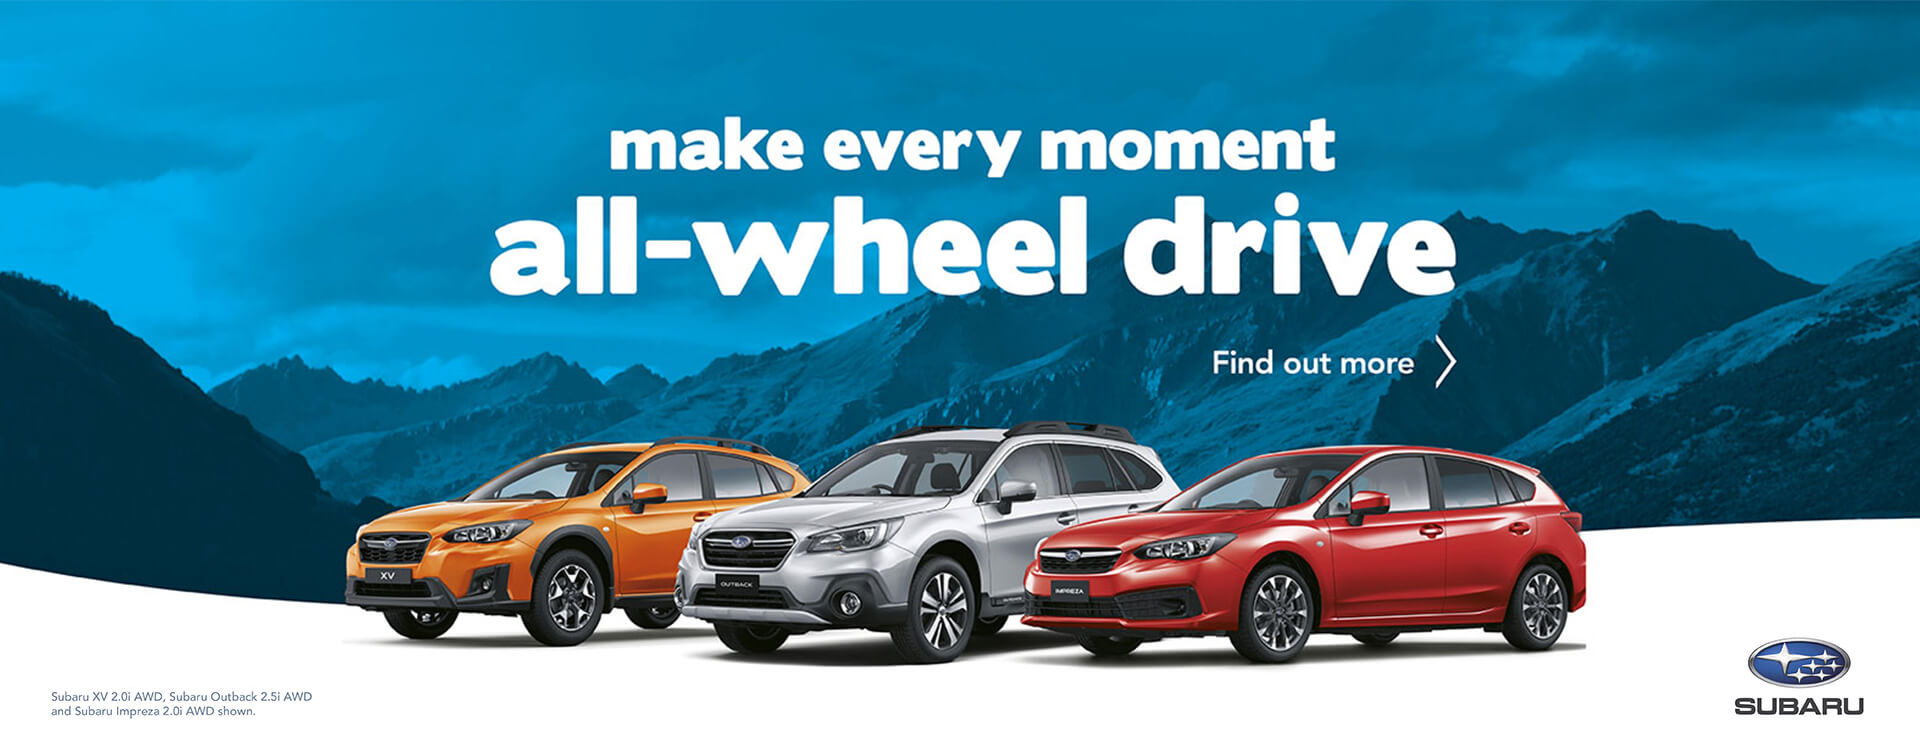 Make every moment all-wheel drive with Subaru.